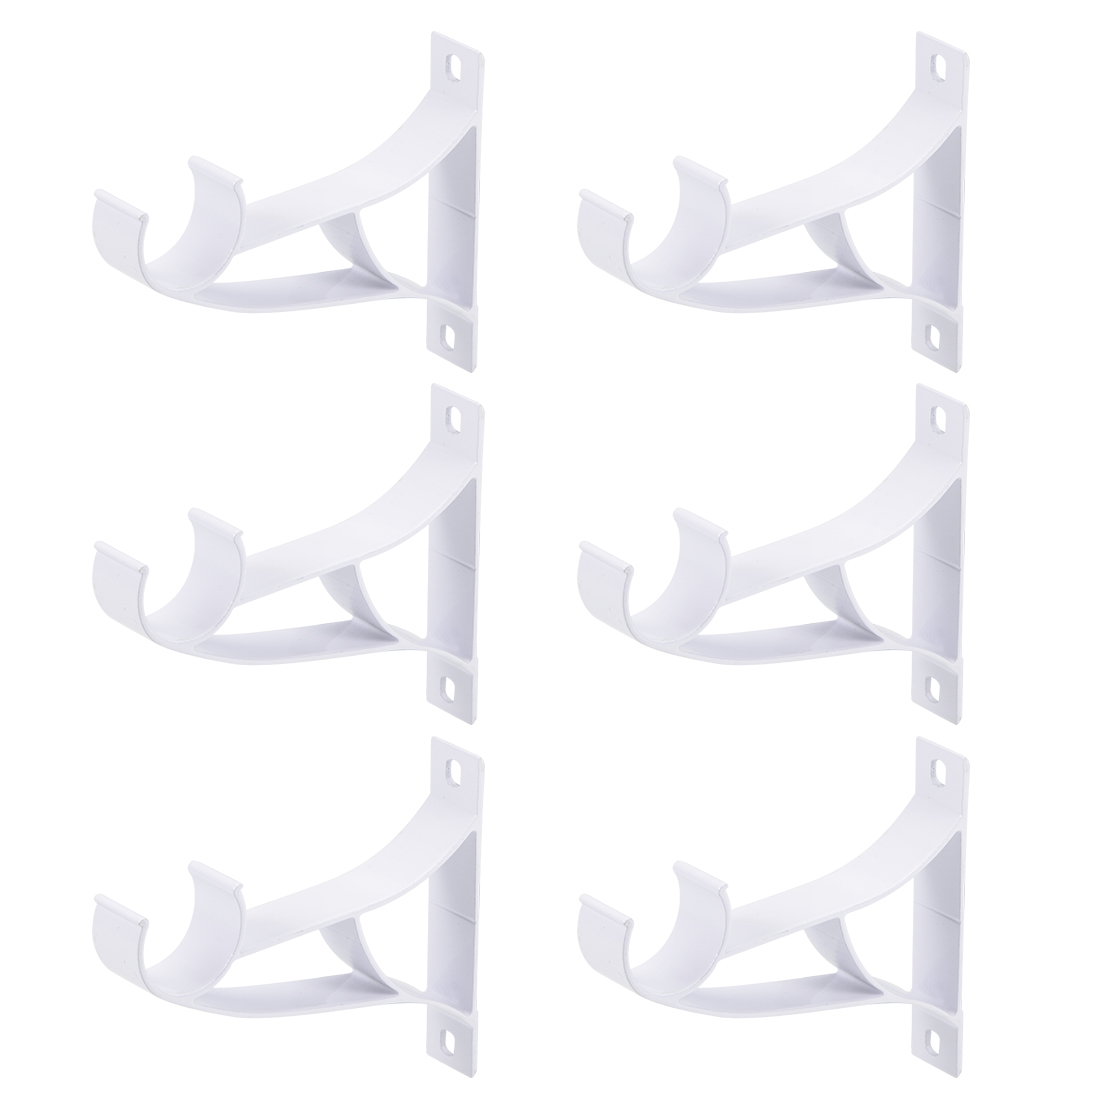 Curtain Rod Pole Bracket Single Holder for 25mm Rod, 94 x 80 x 16mm White 6 Pcs